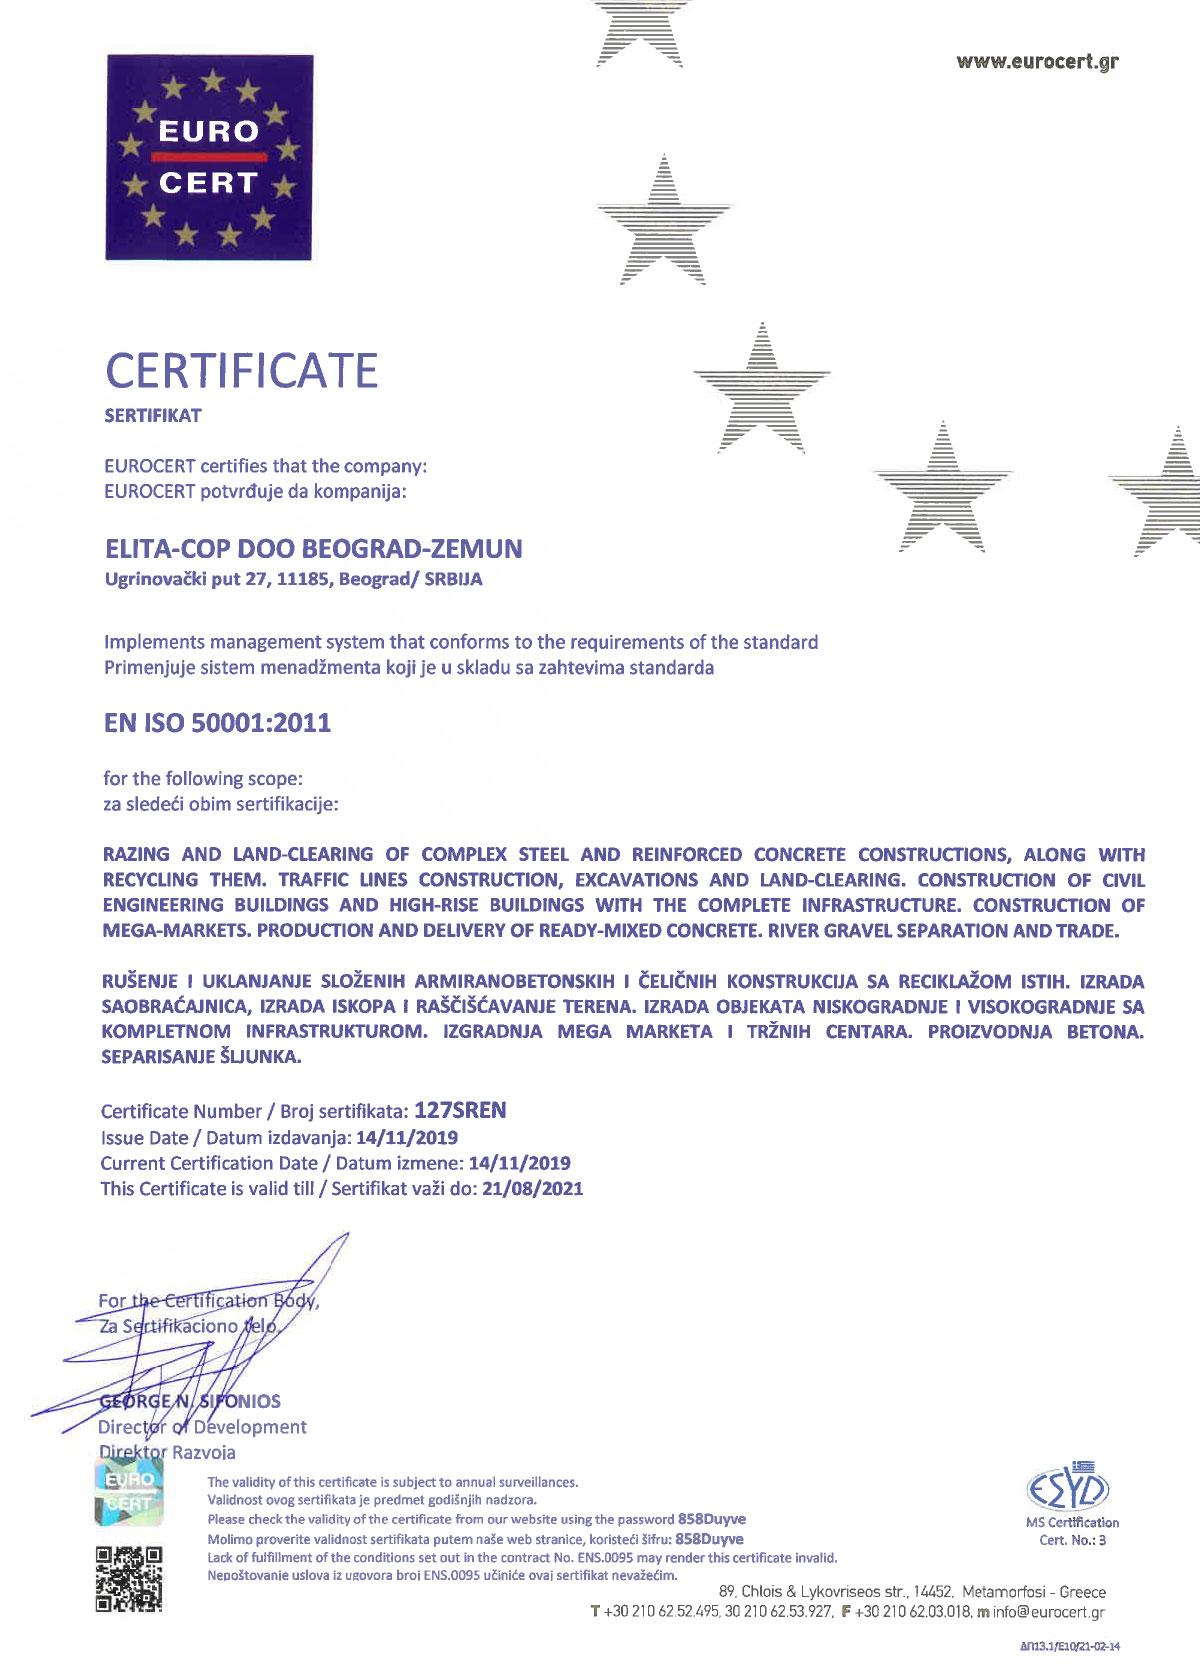 Elita Cop ISO 50001:2011